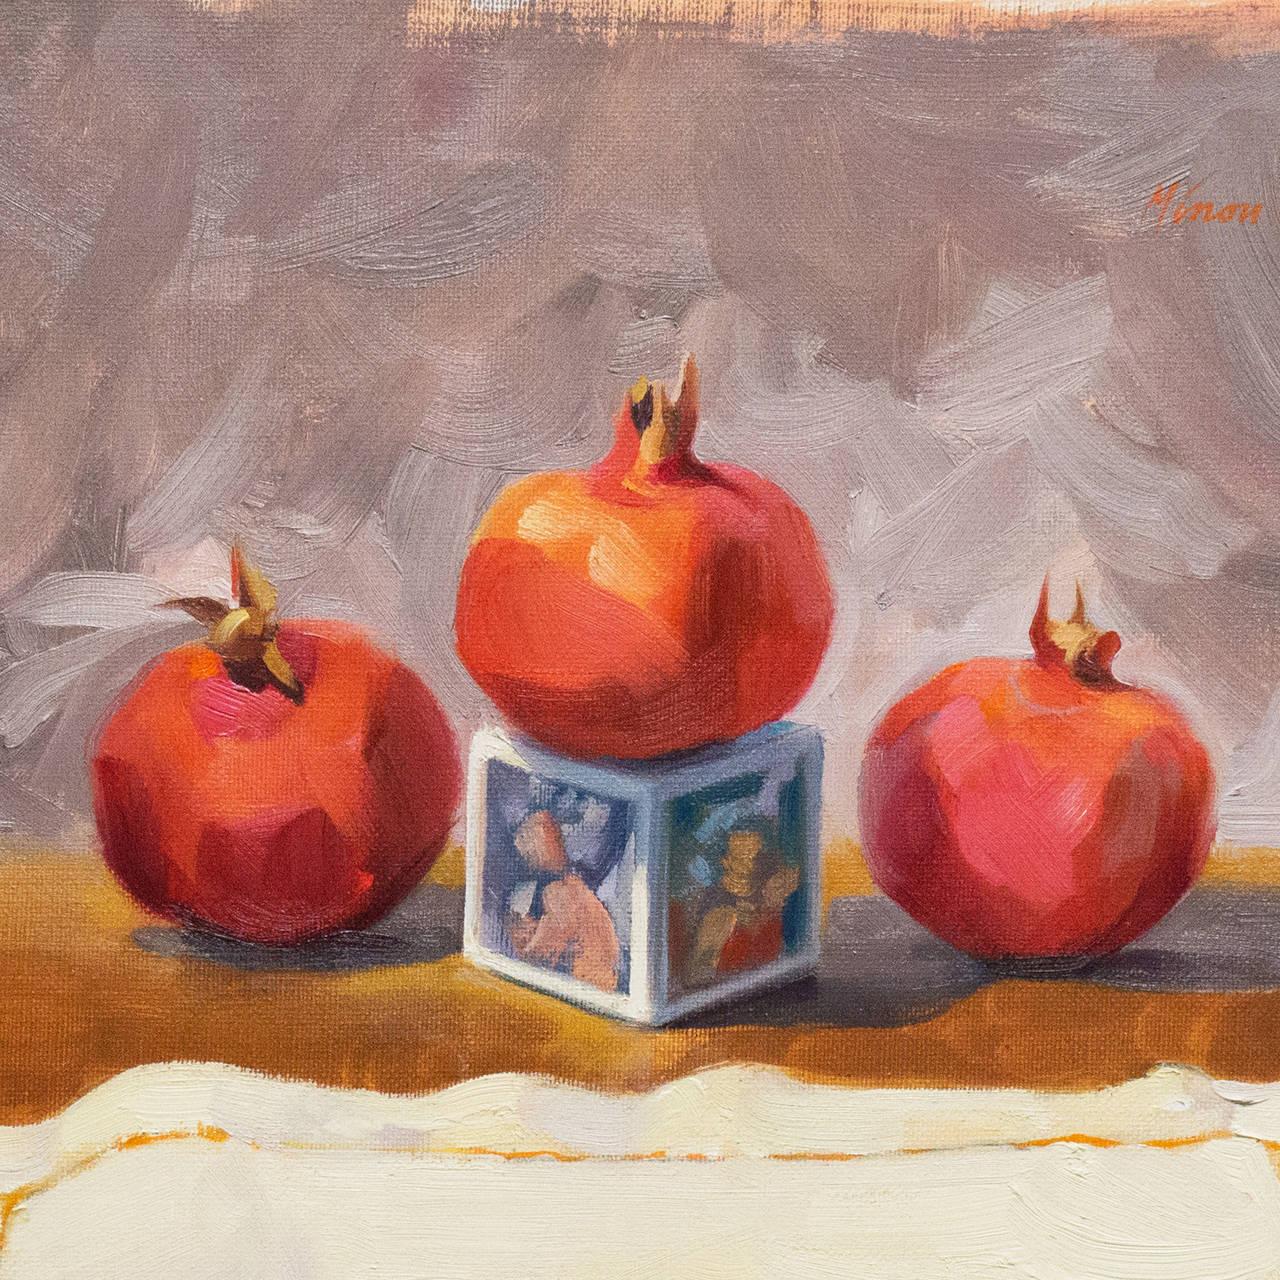 'Still Life with Pomegranates', California woman artist, Carmel Art Association - Painting by Carole Minou